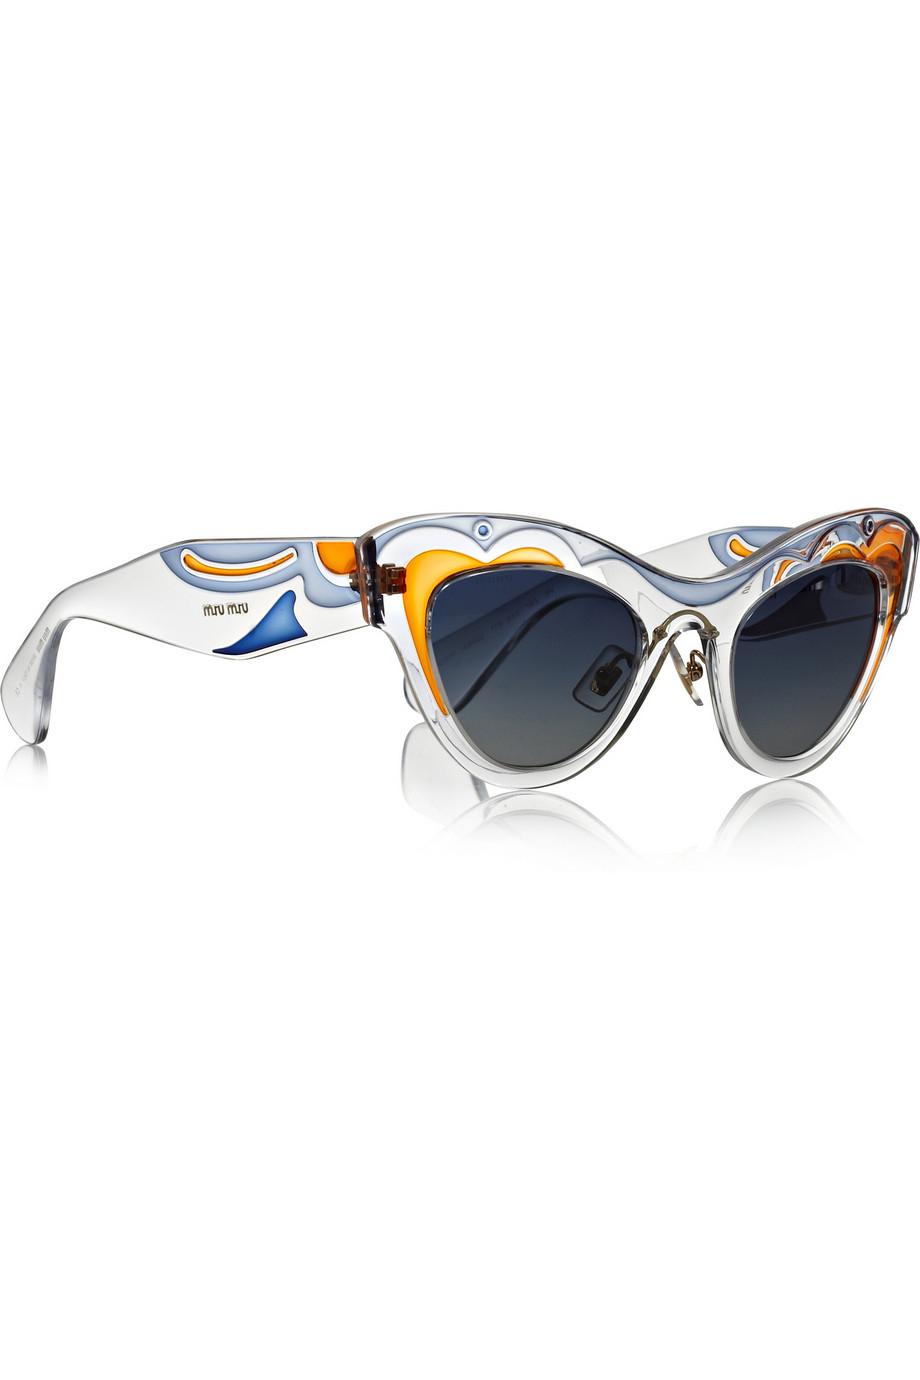 c1c6cf34eb58 Lyst - Miu Miu Painted Cat Eye Acetate Sunglasses